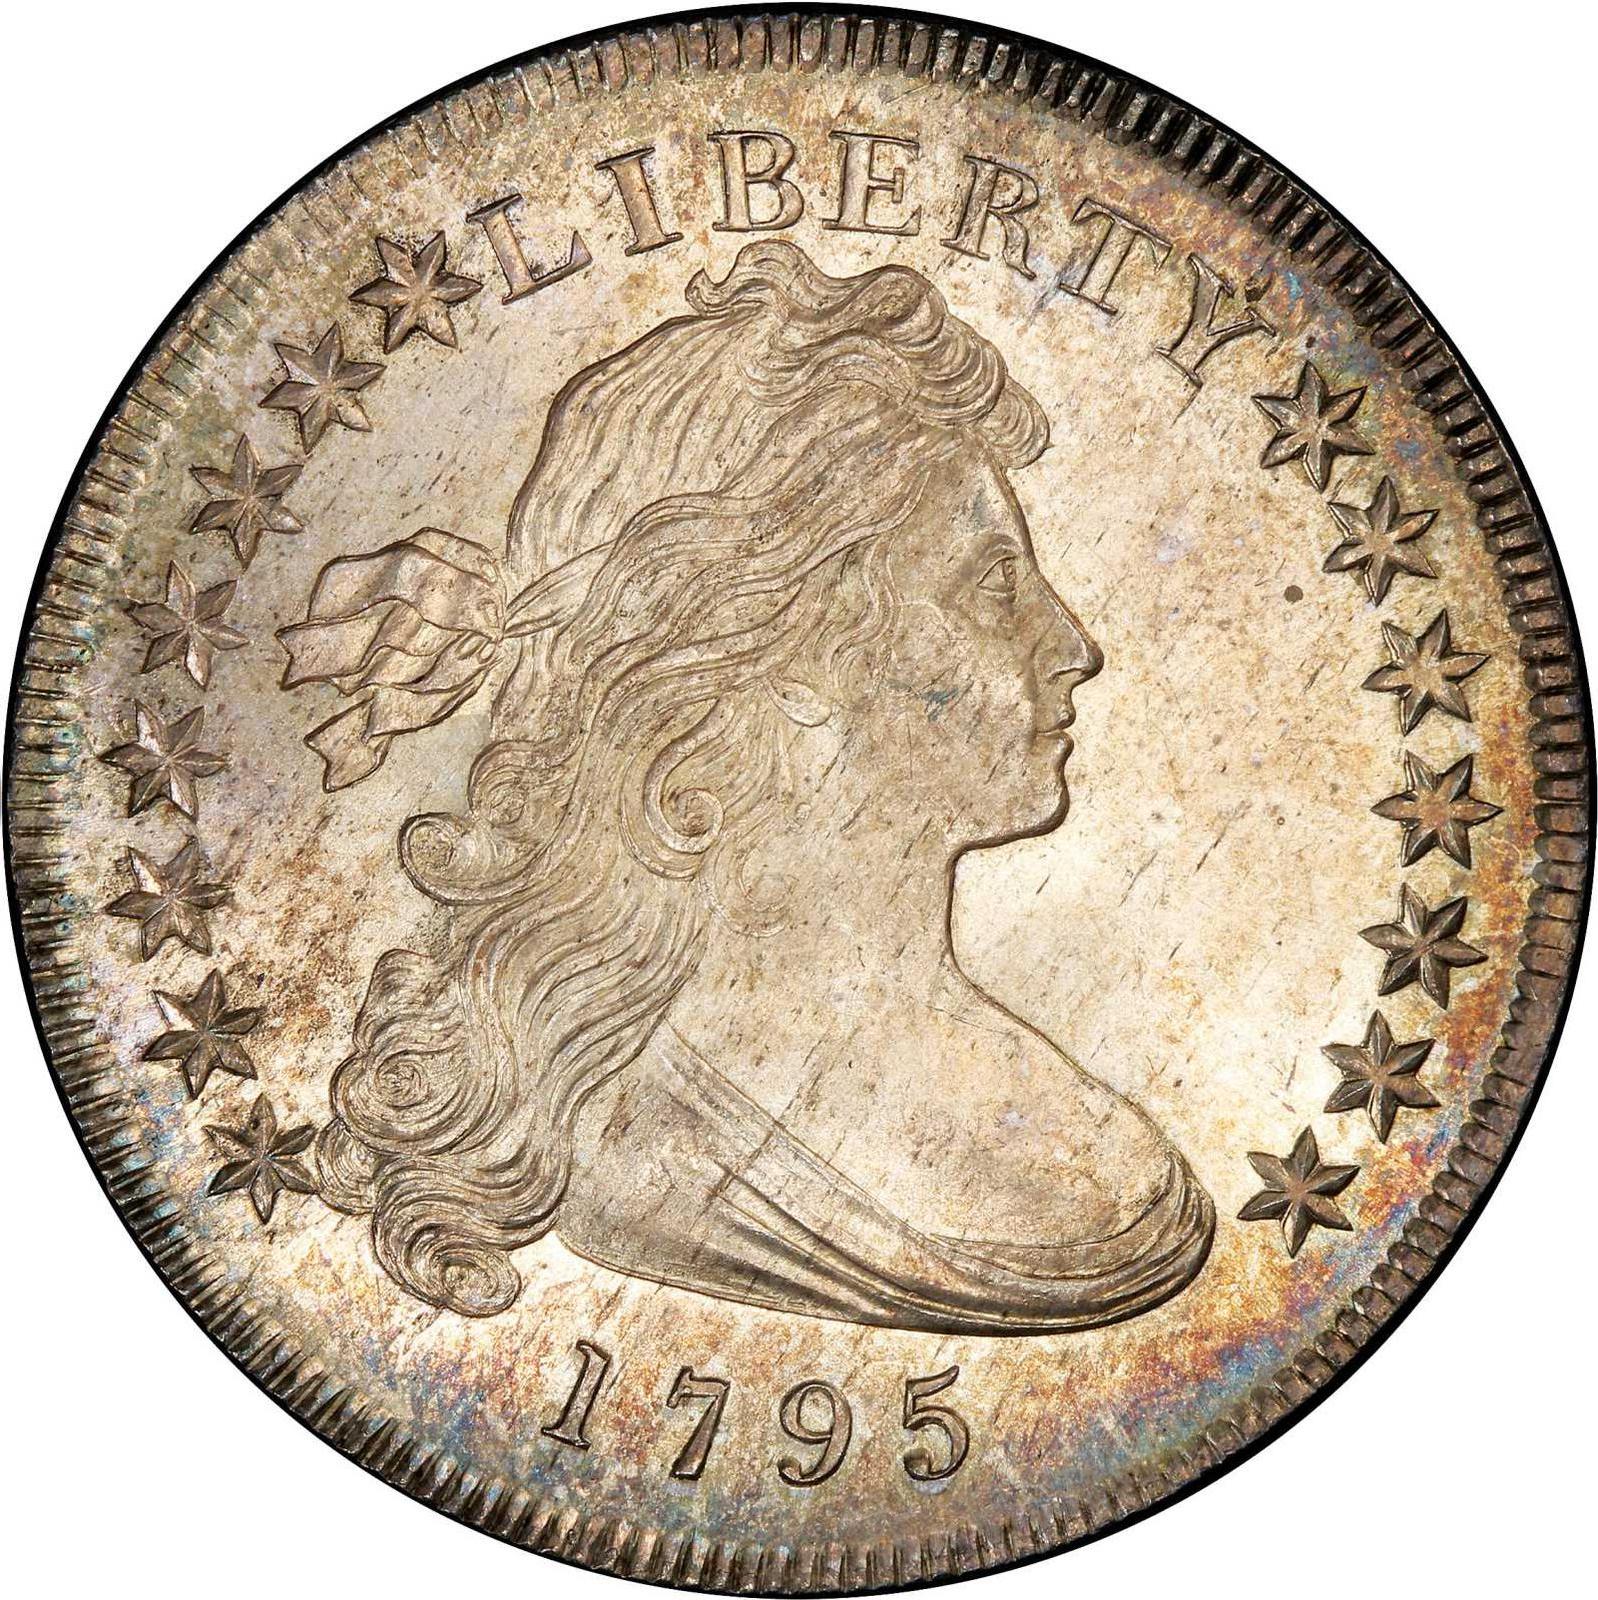 16-1795-obverse